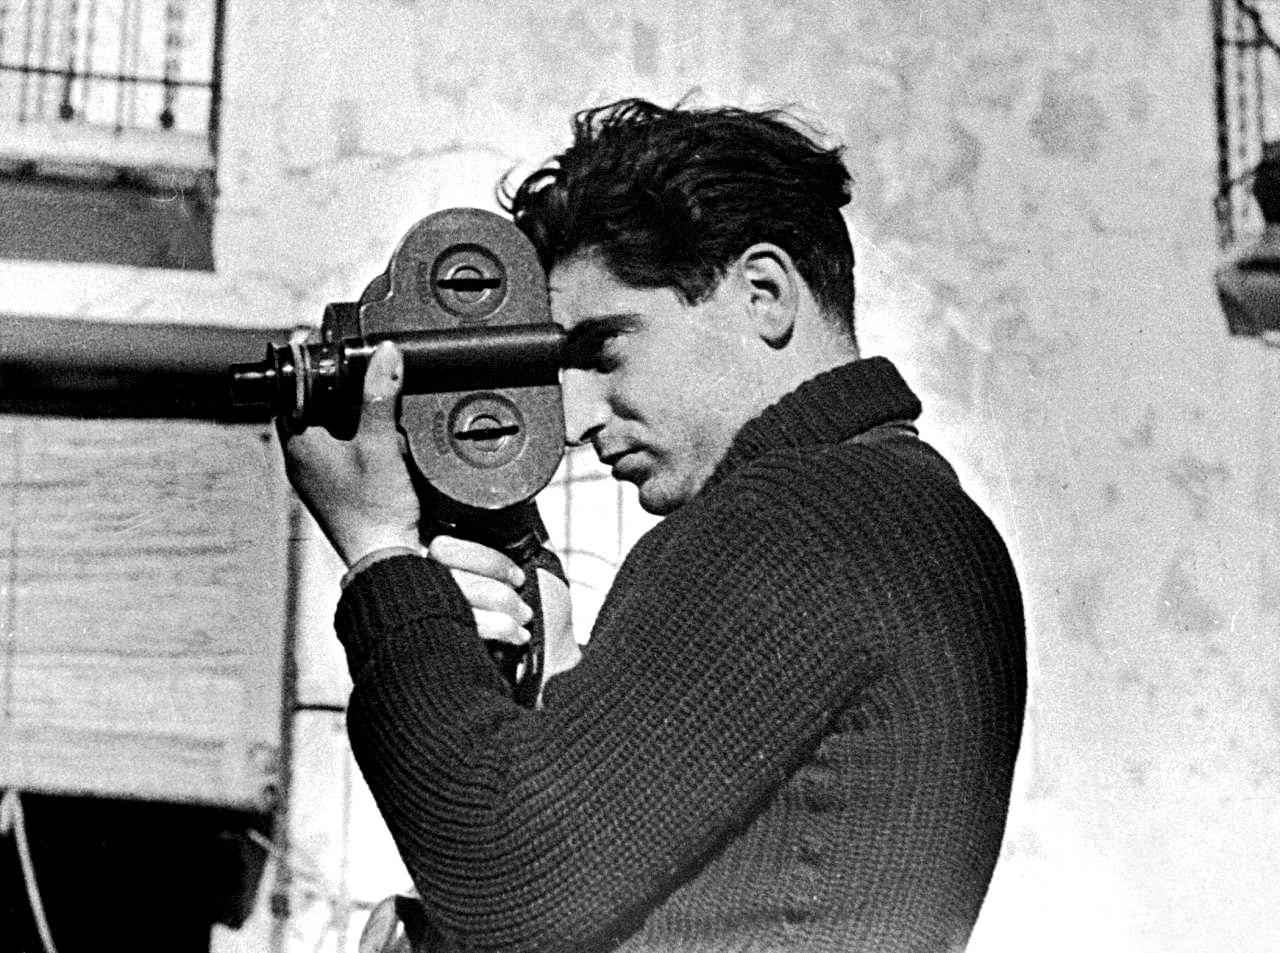 fotógrafo Robert Capa